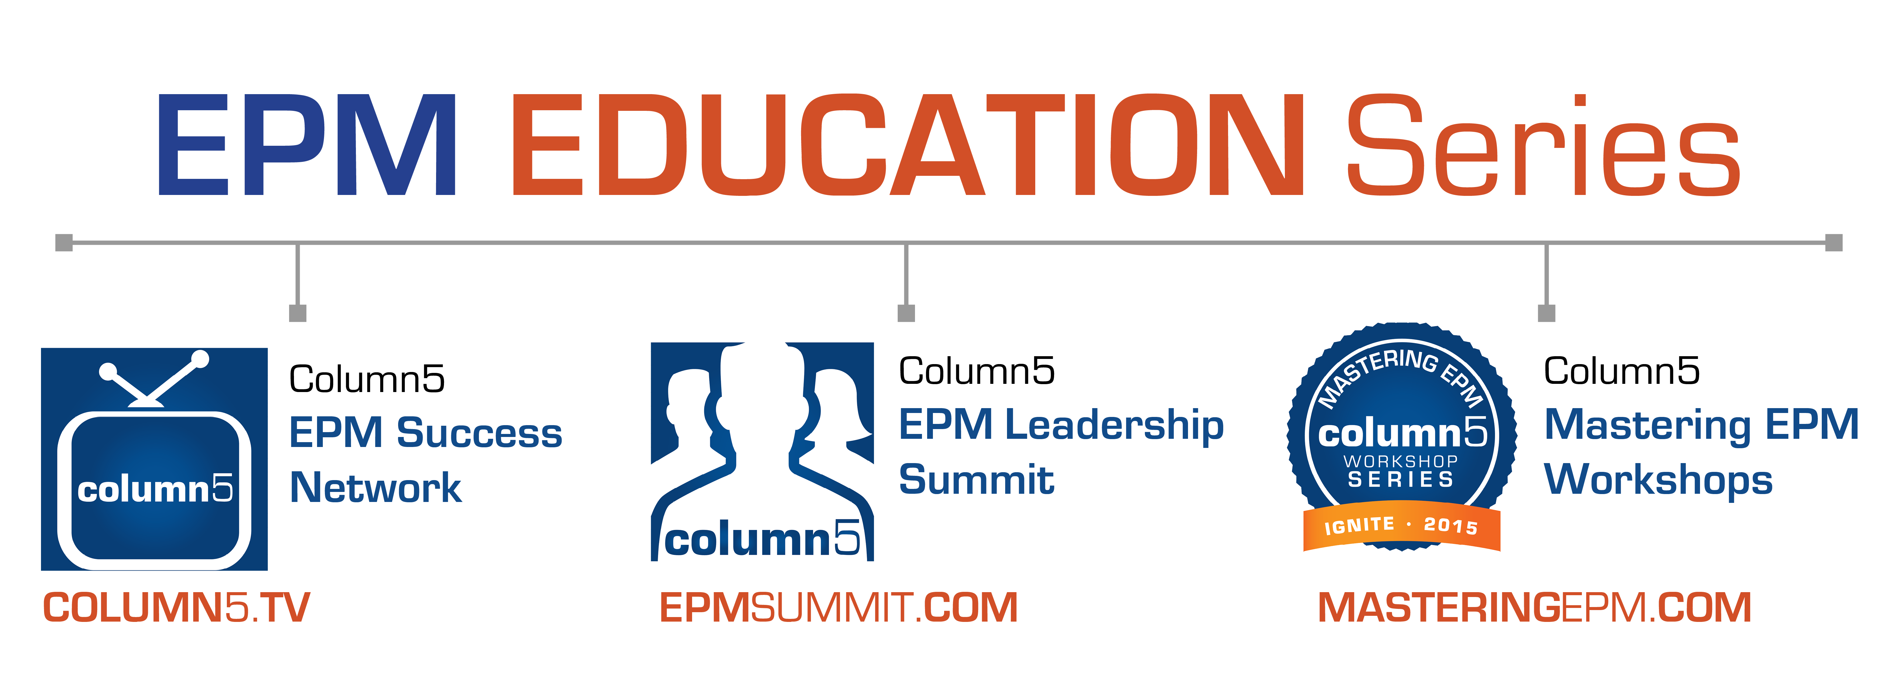 EPMEducationSeries_Slider